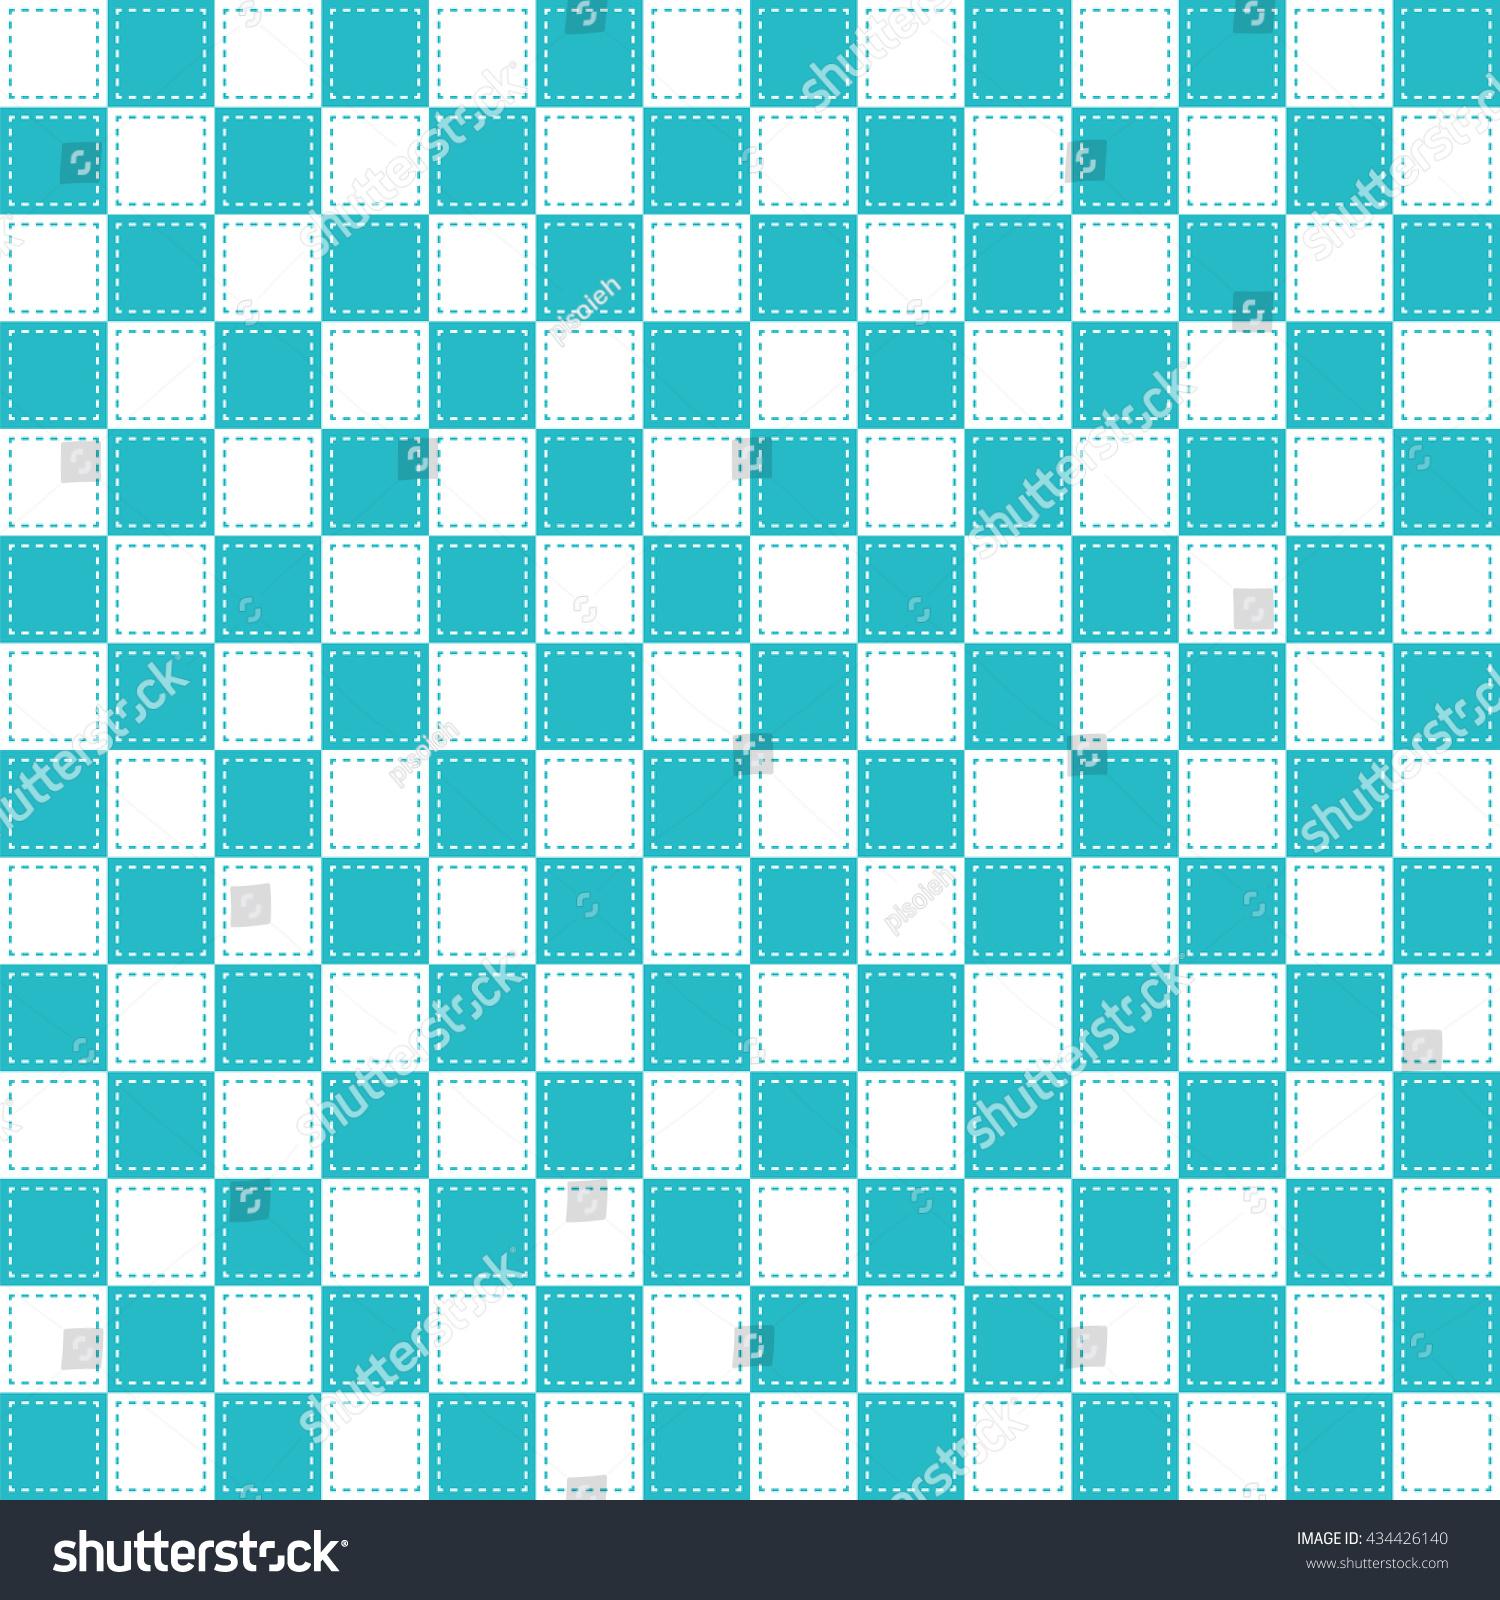 Green White Checkered Background Seamless Stock Vector 434426140 ...